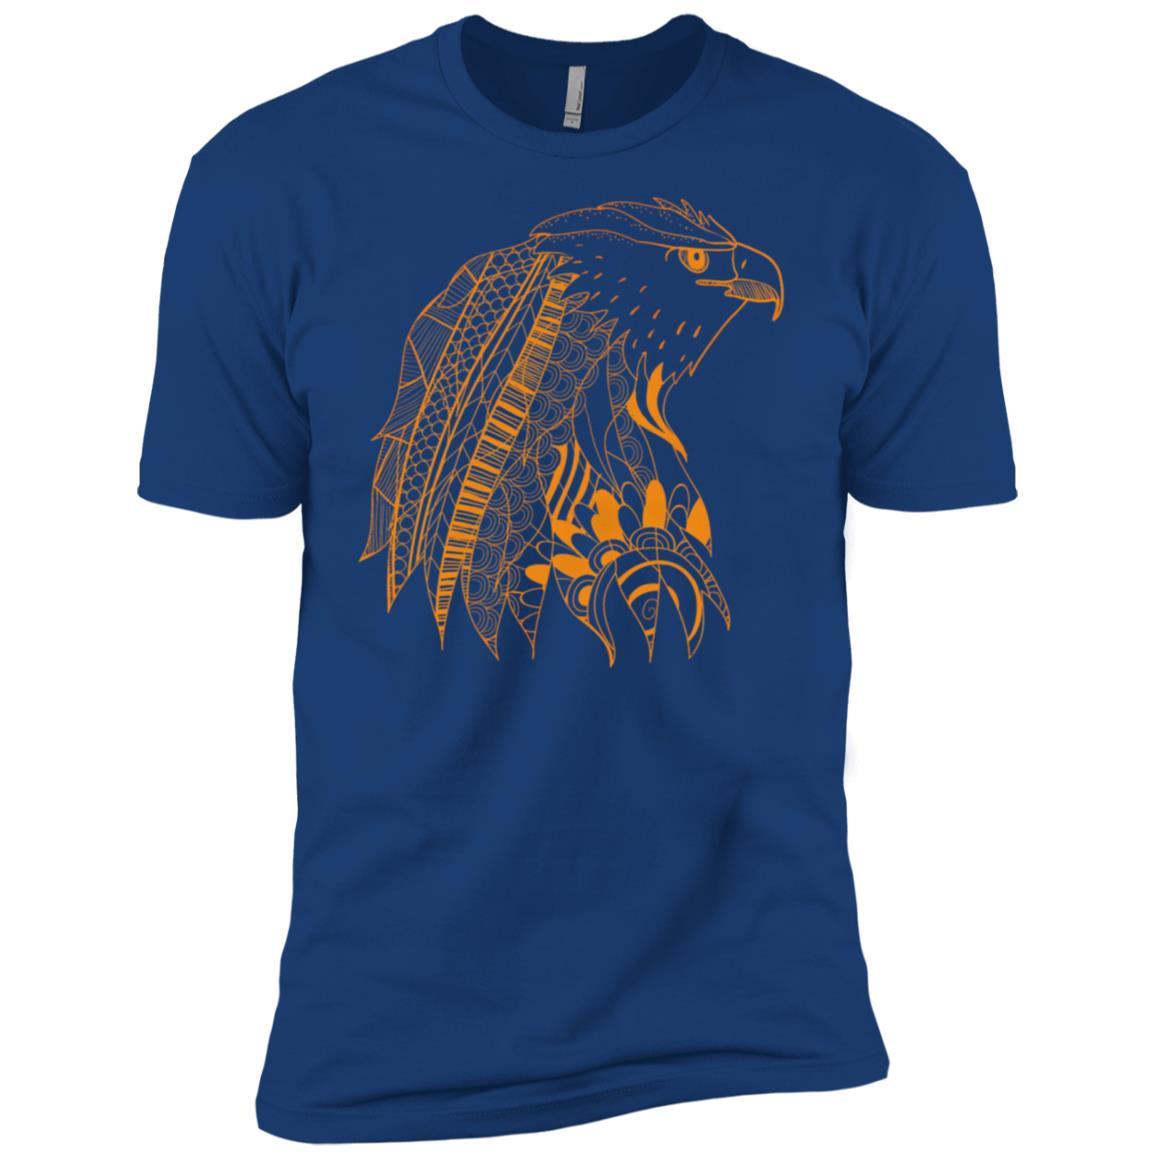 Eagle Adler – Artwork Drawing Men Short Sleeve T-Shirt